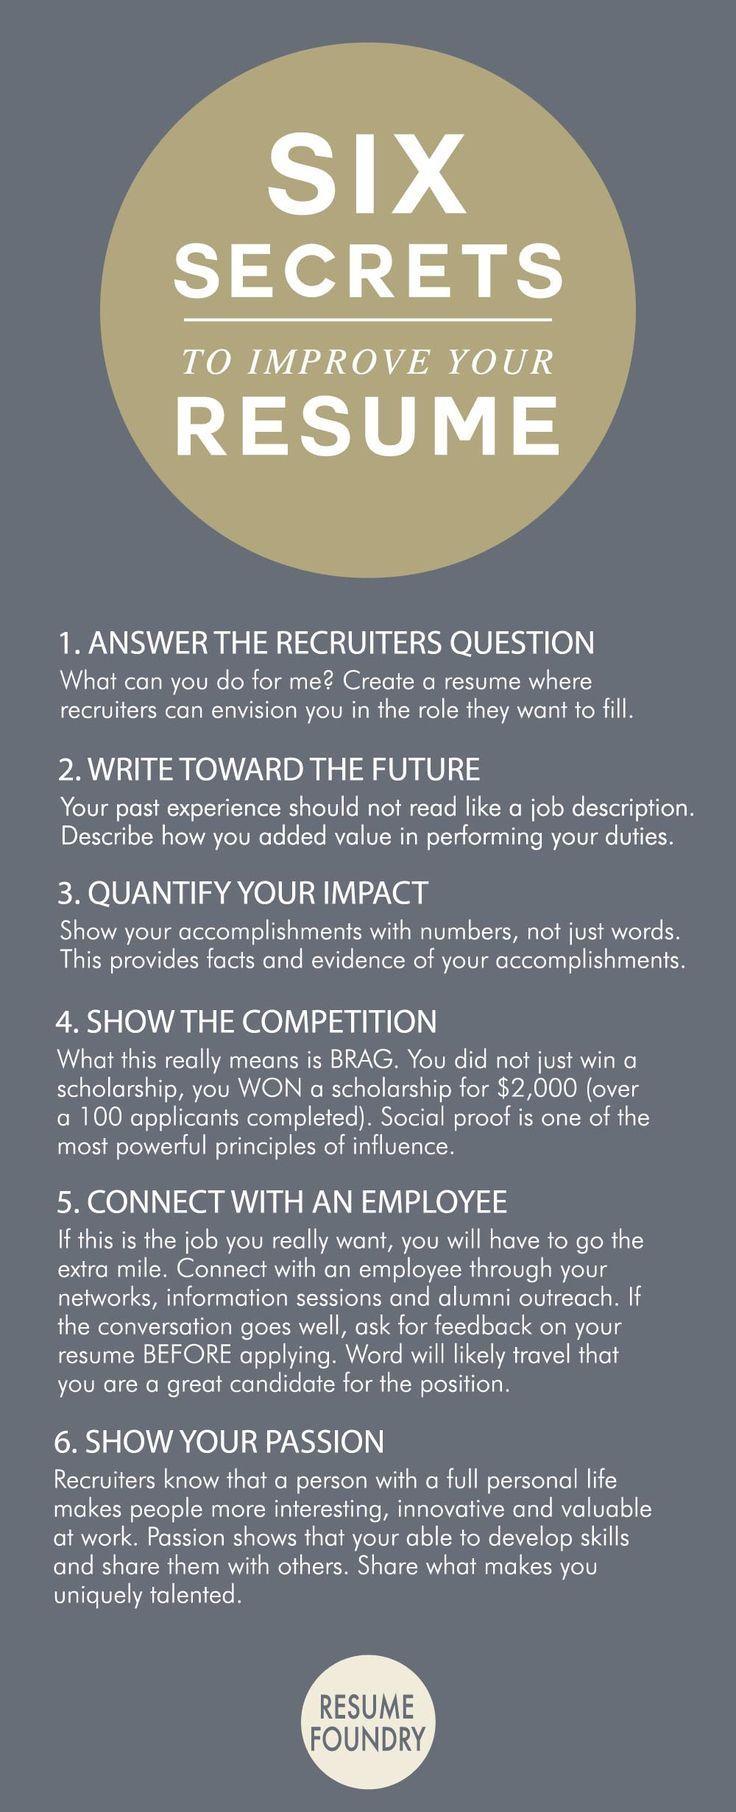 Resume Infographic U0026 Advice Six Amazing Secrets To Improve Your Resume.  Image Description Six Amazing Secrets To Improve Your Resume.